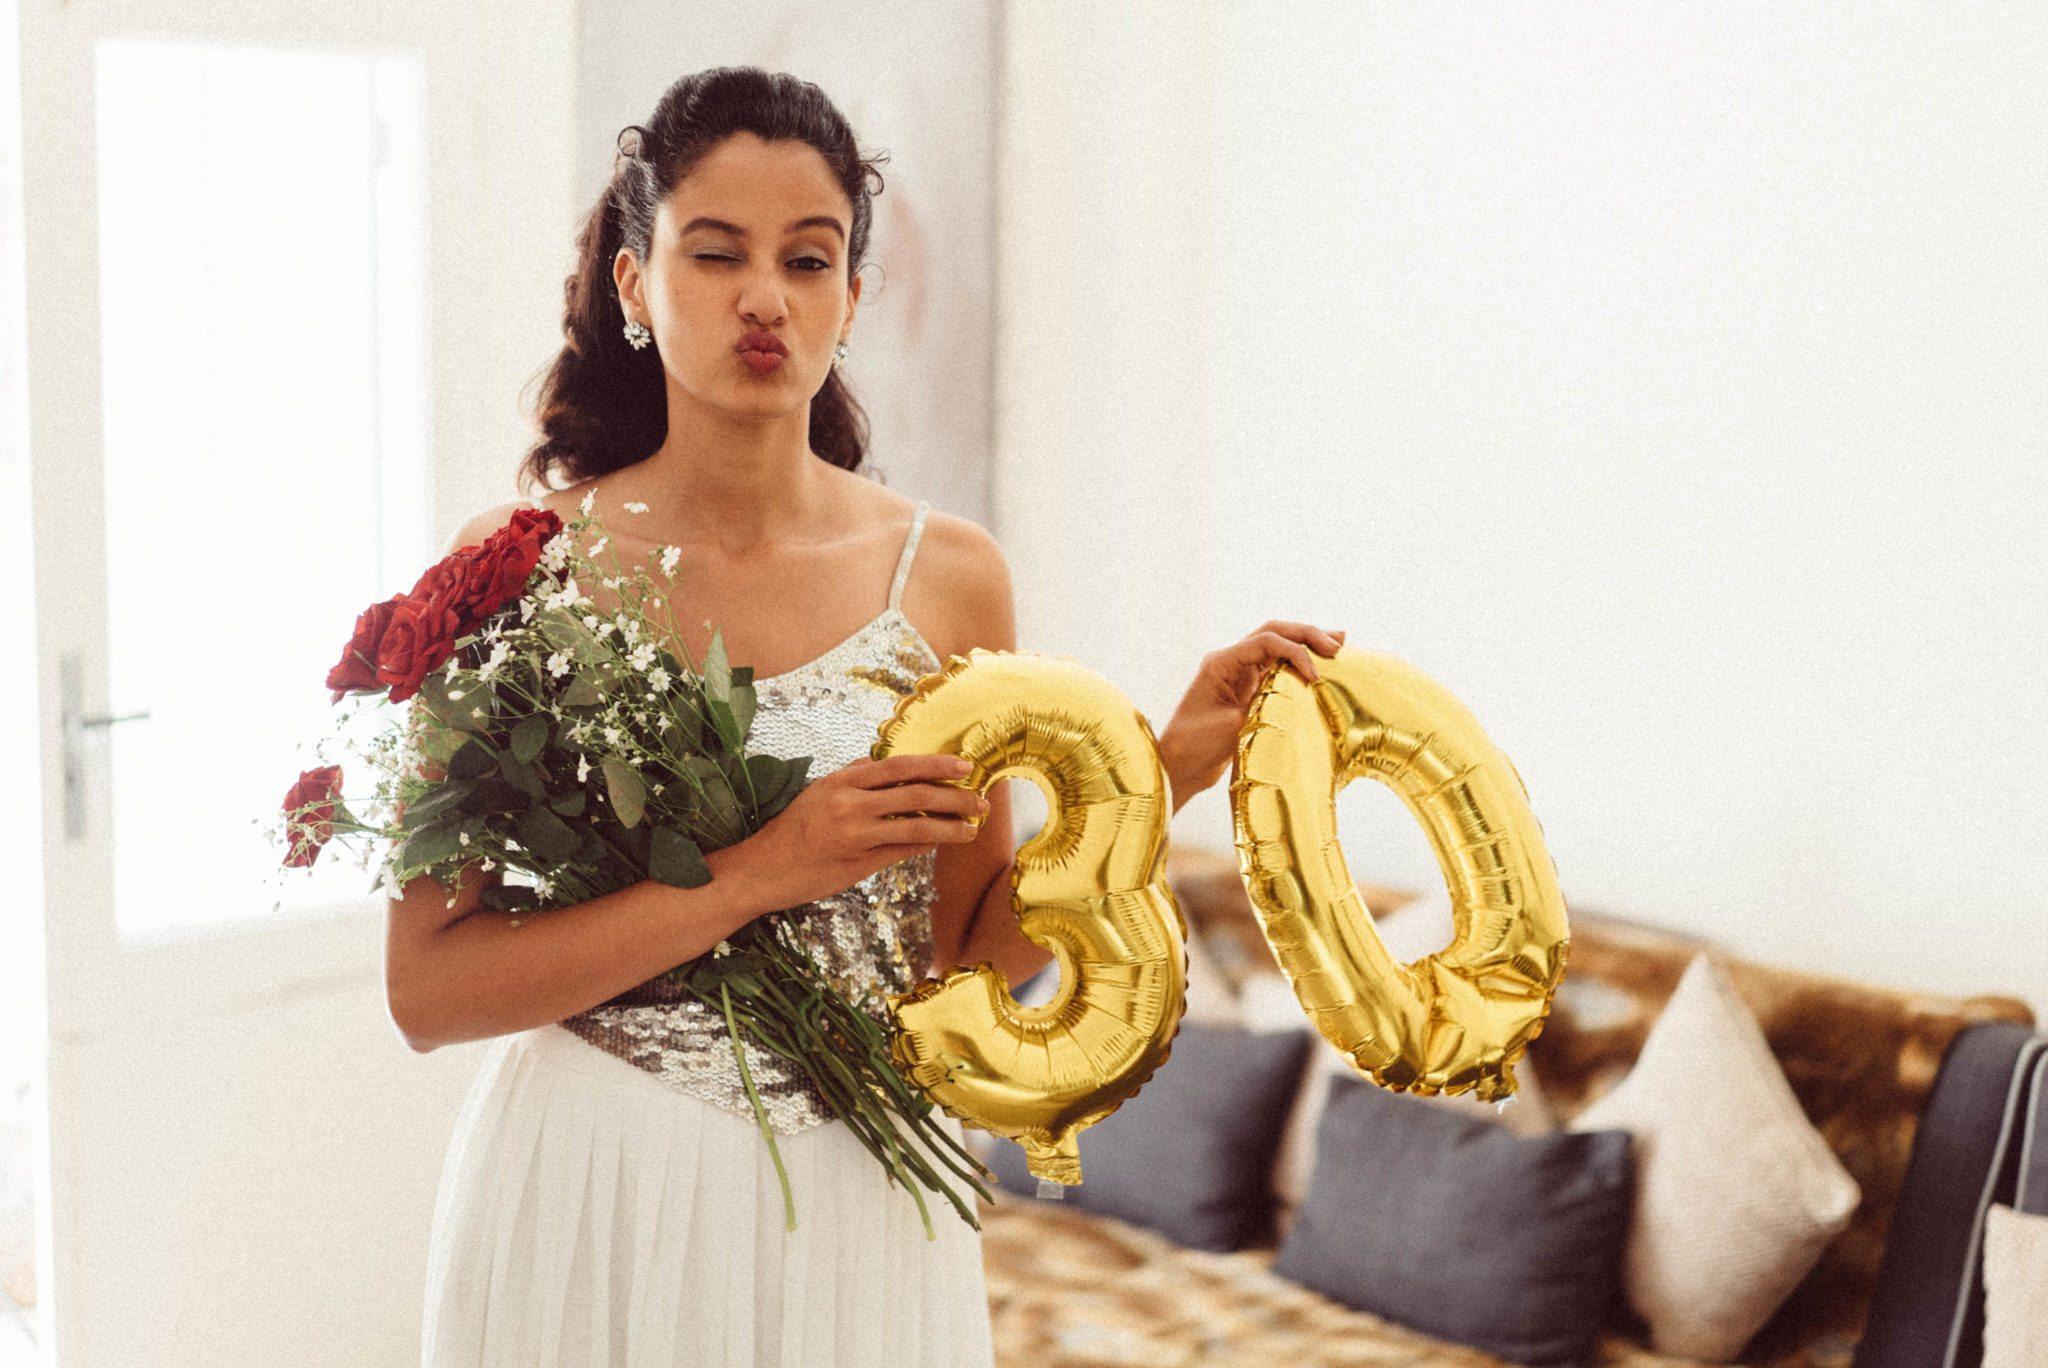 Happy birthday to me, I am turning 30!